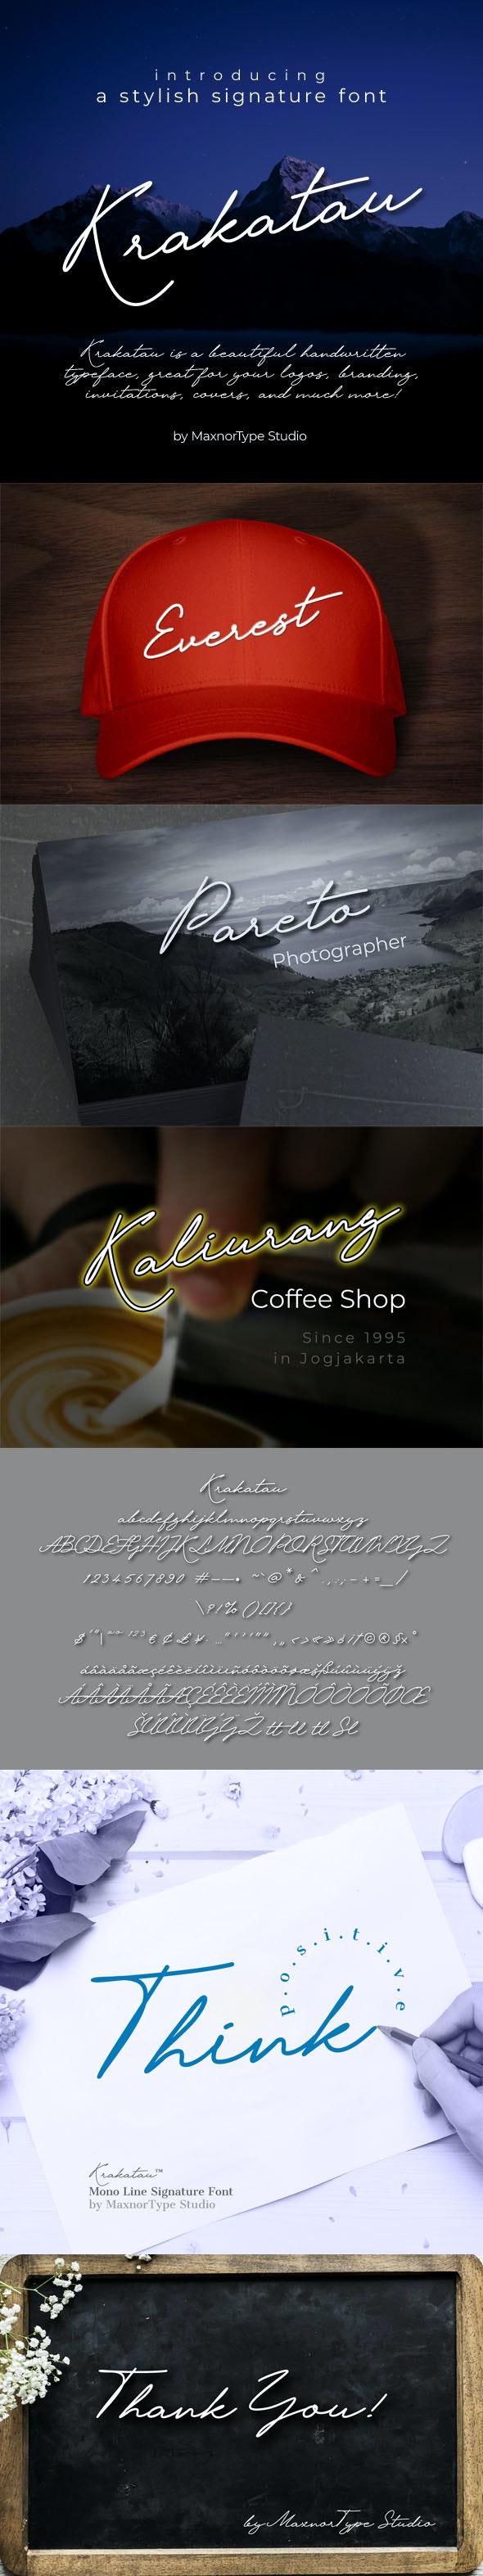 Krakatau Signature Font - Hand-writing Script